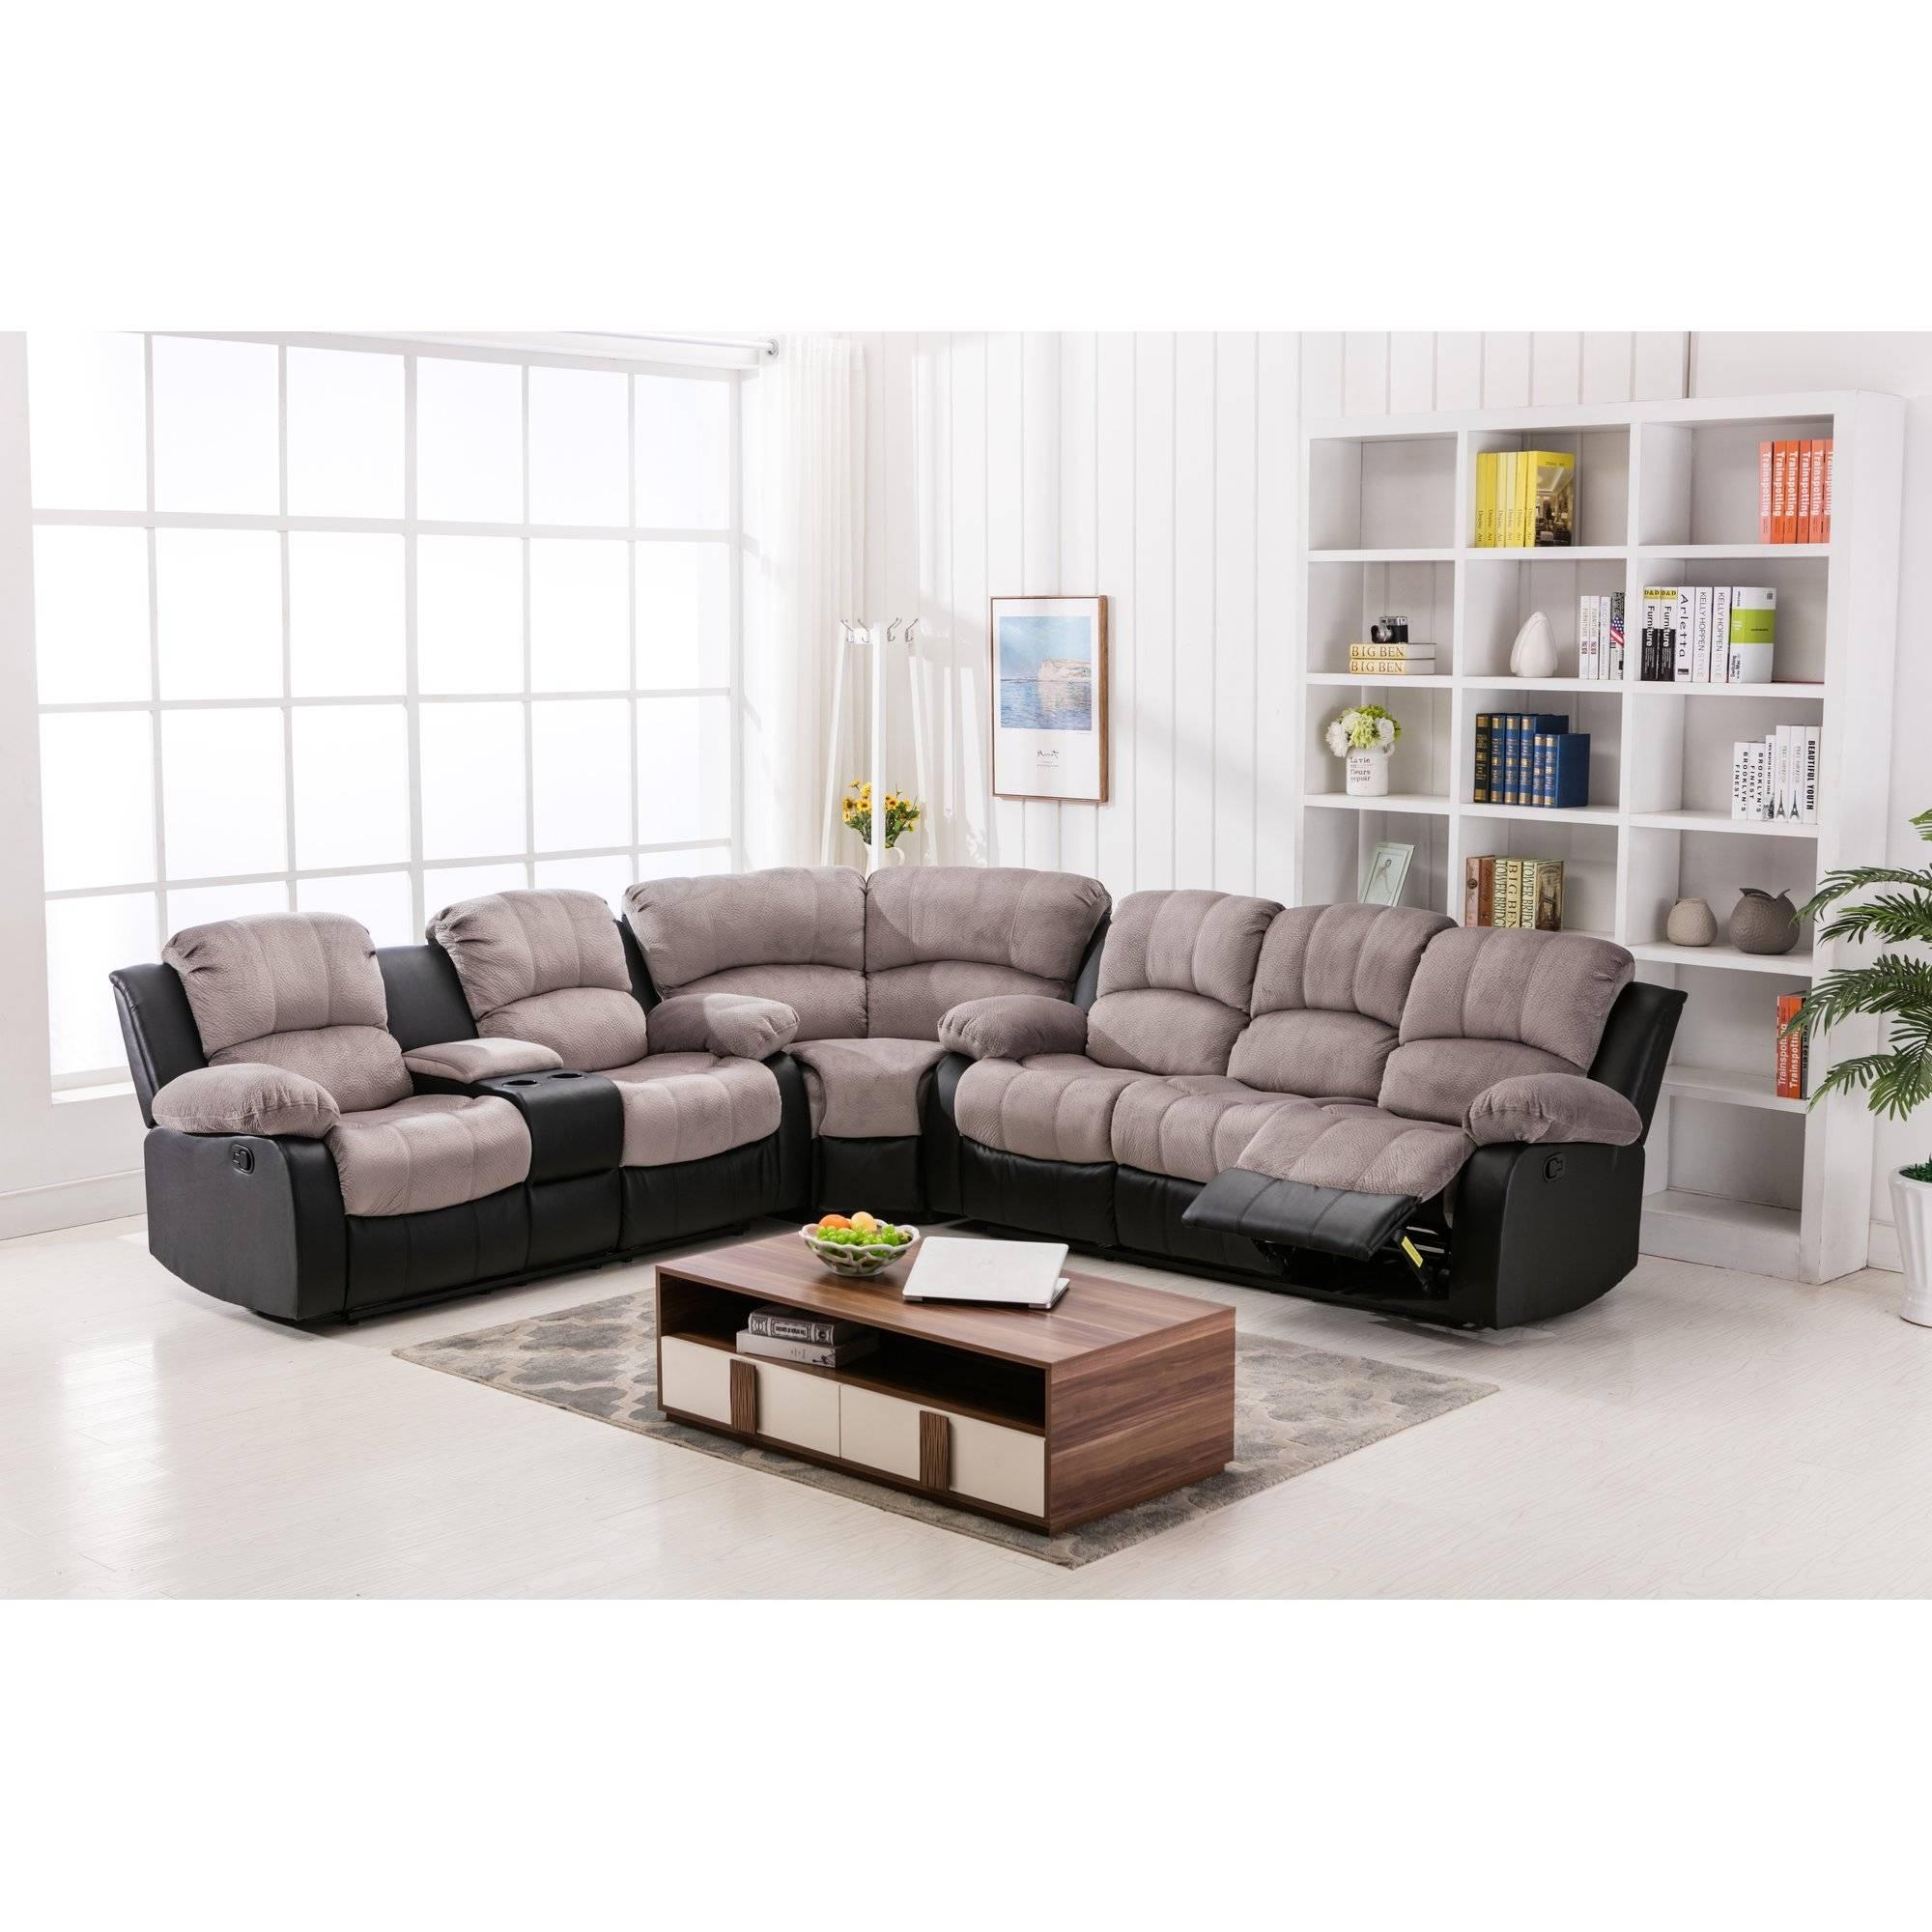 30 Best Jedd Fabric Reclining Sectional Sofa